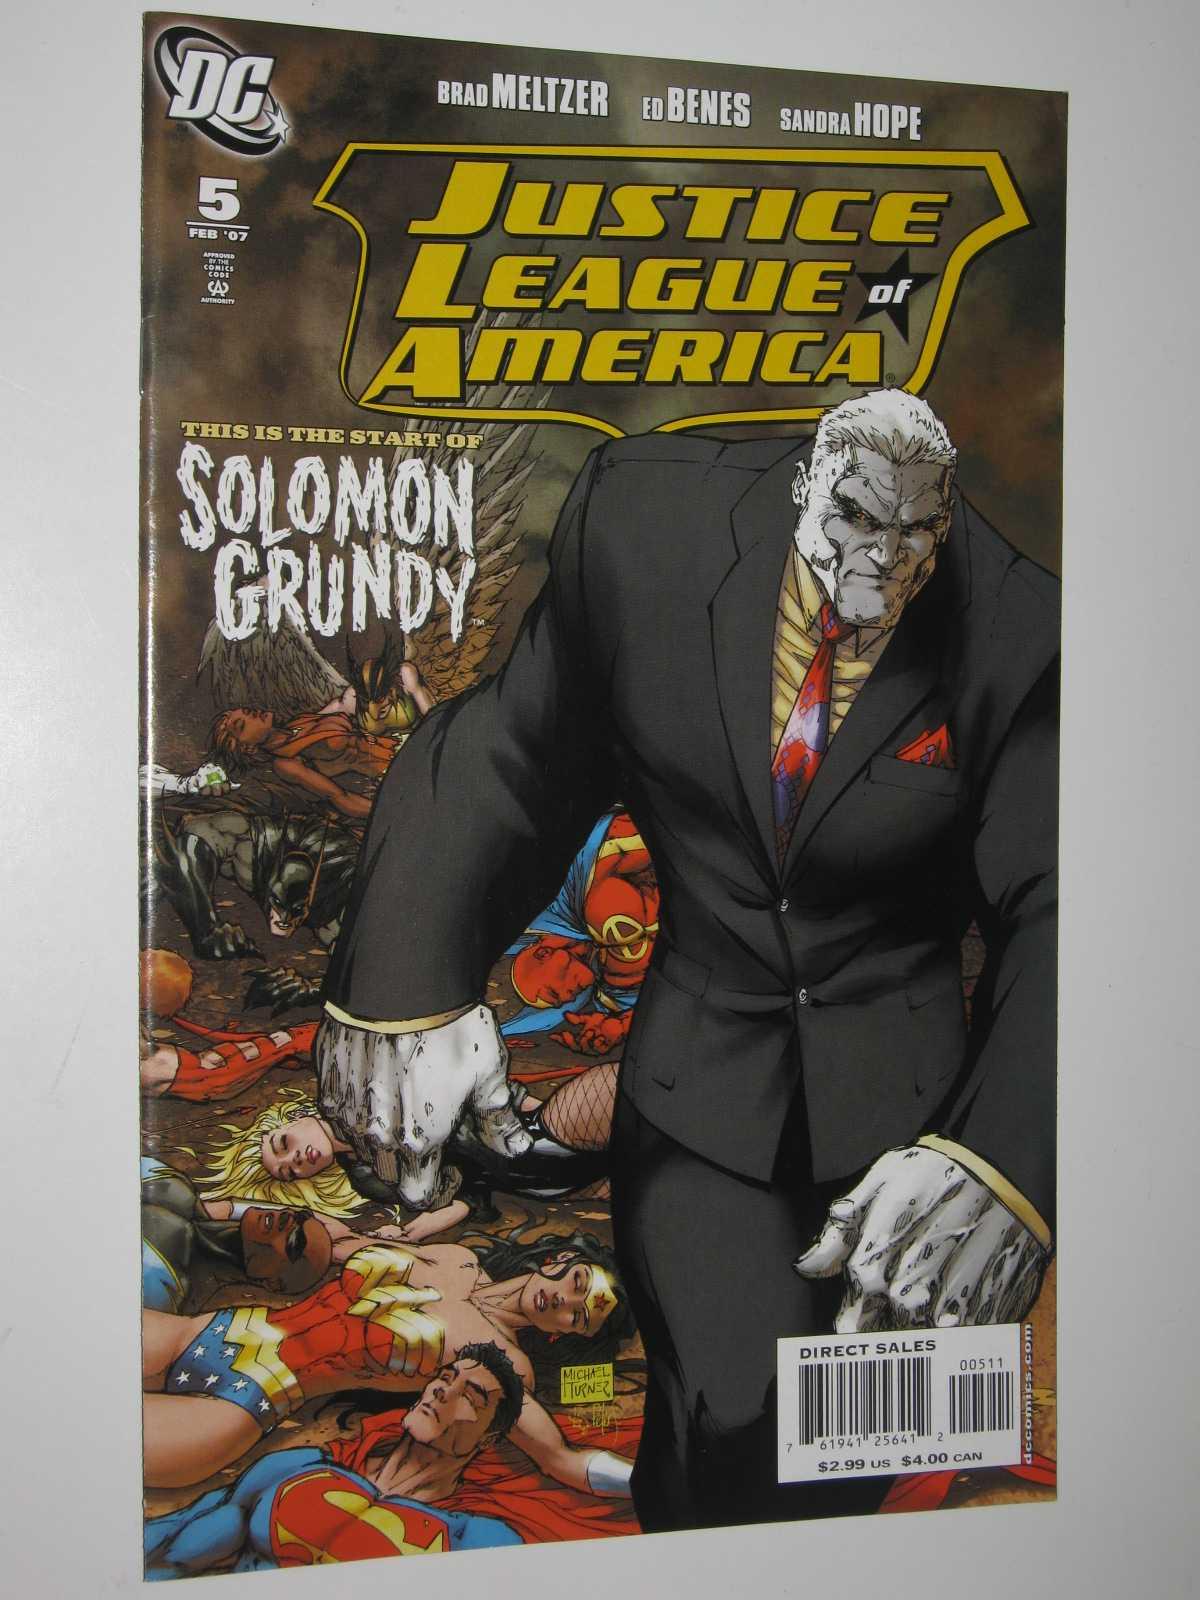 Justice League of America #5 : February 2007, Meltzer, Brad